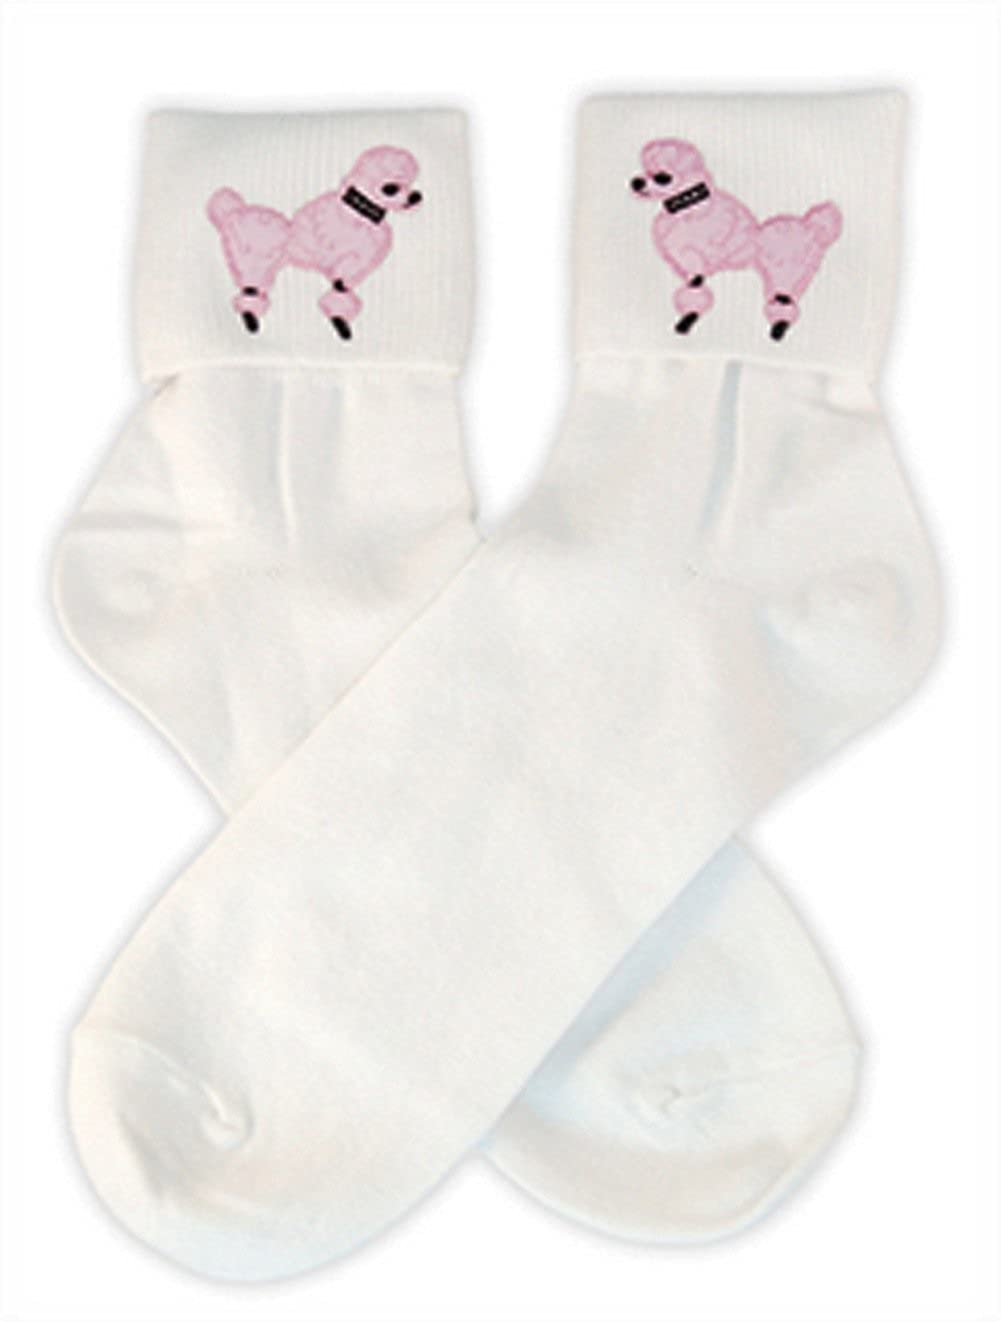 1950s Socks- Women's Bobby Socks  Bobby Sock W/Poodle Applique $9.84 AT vintagedancer.com